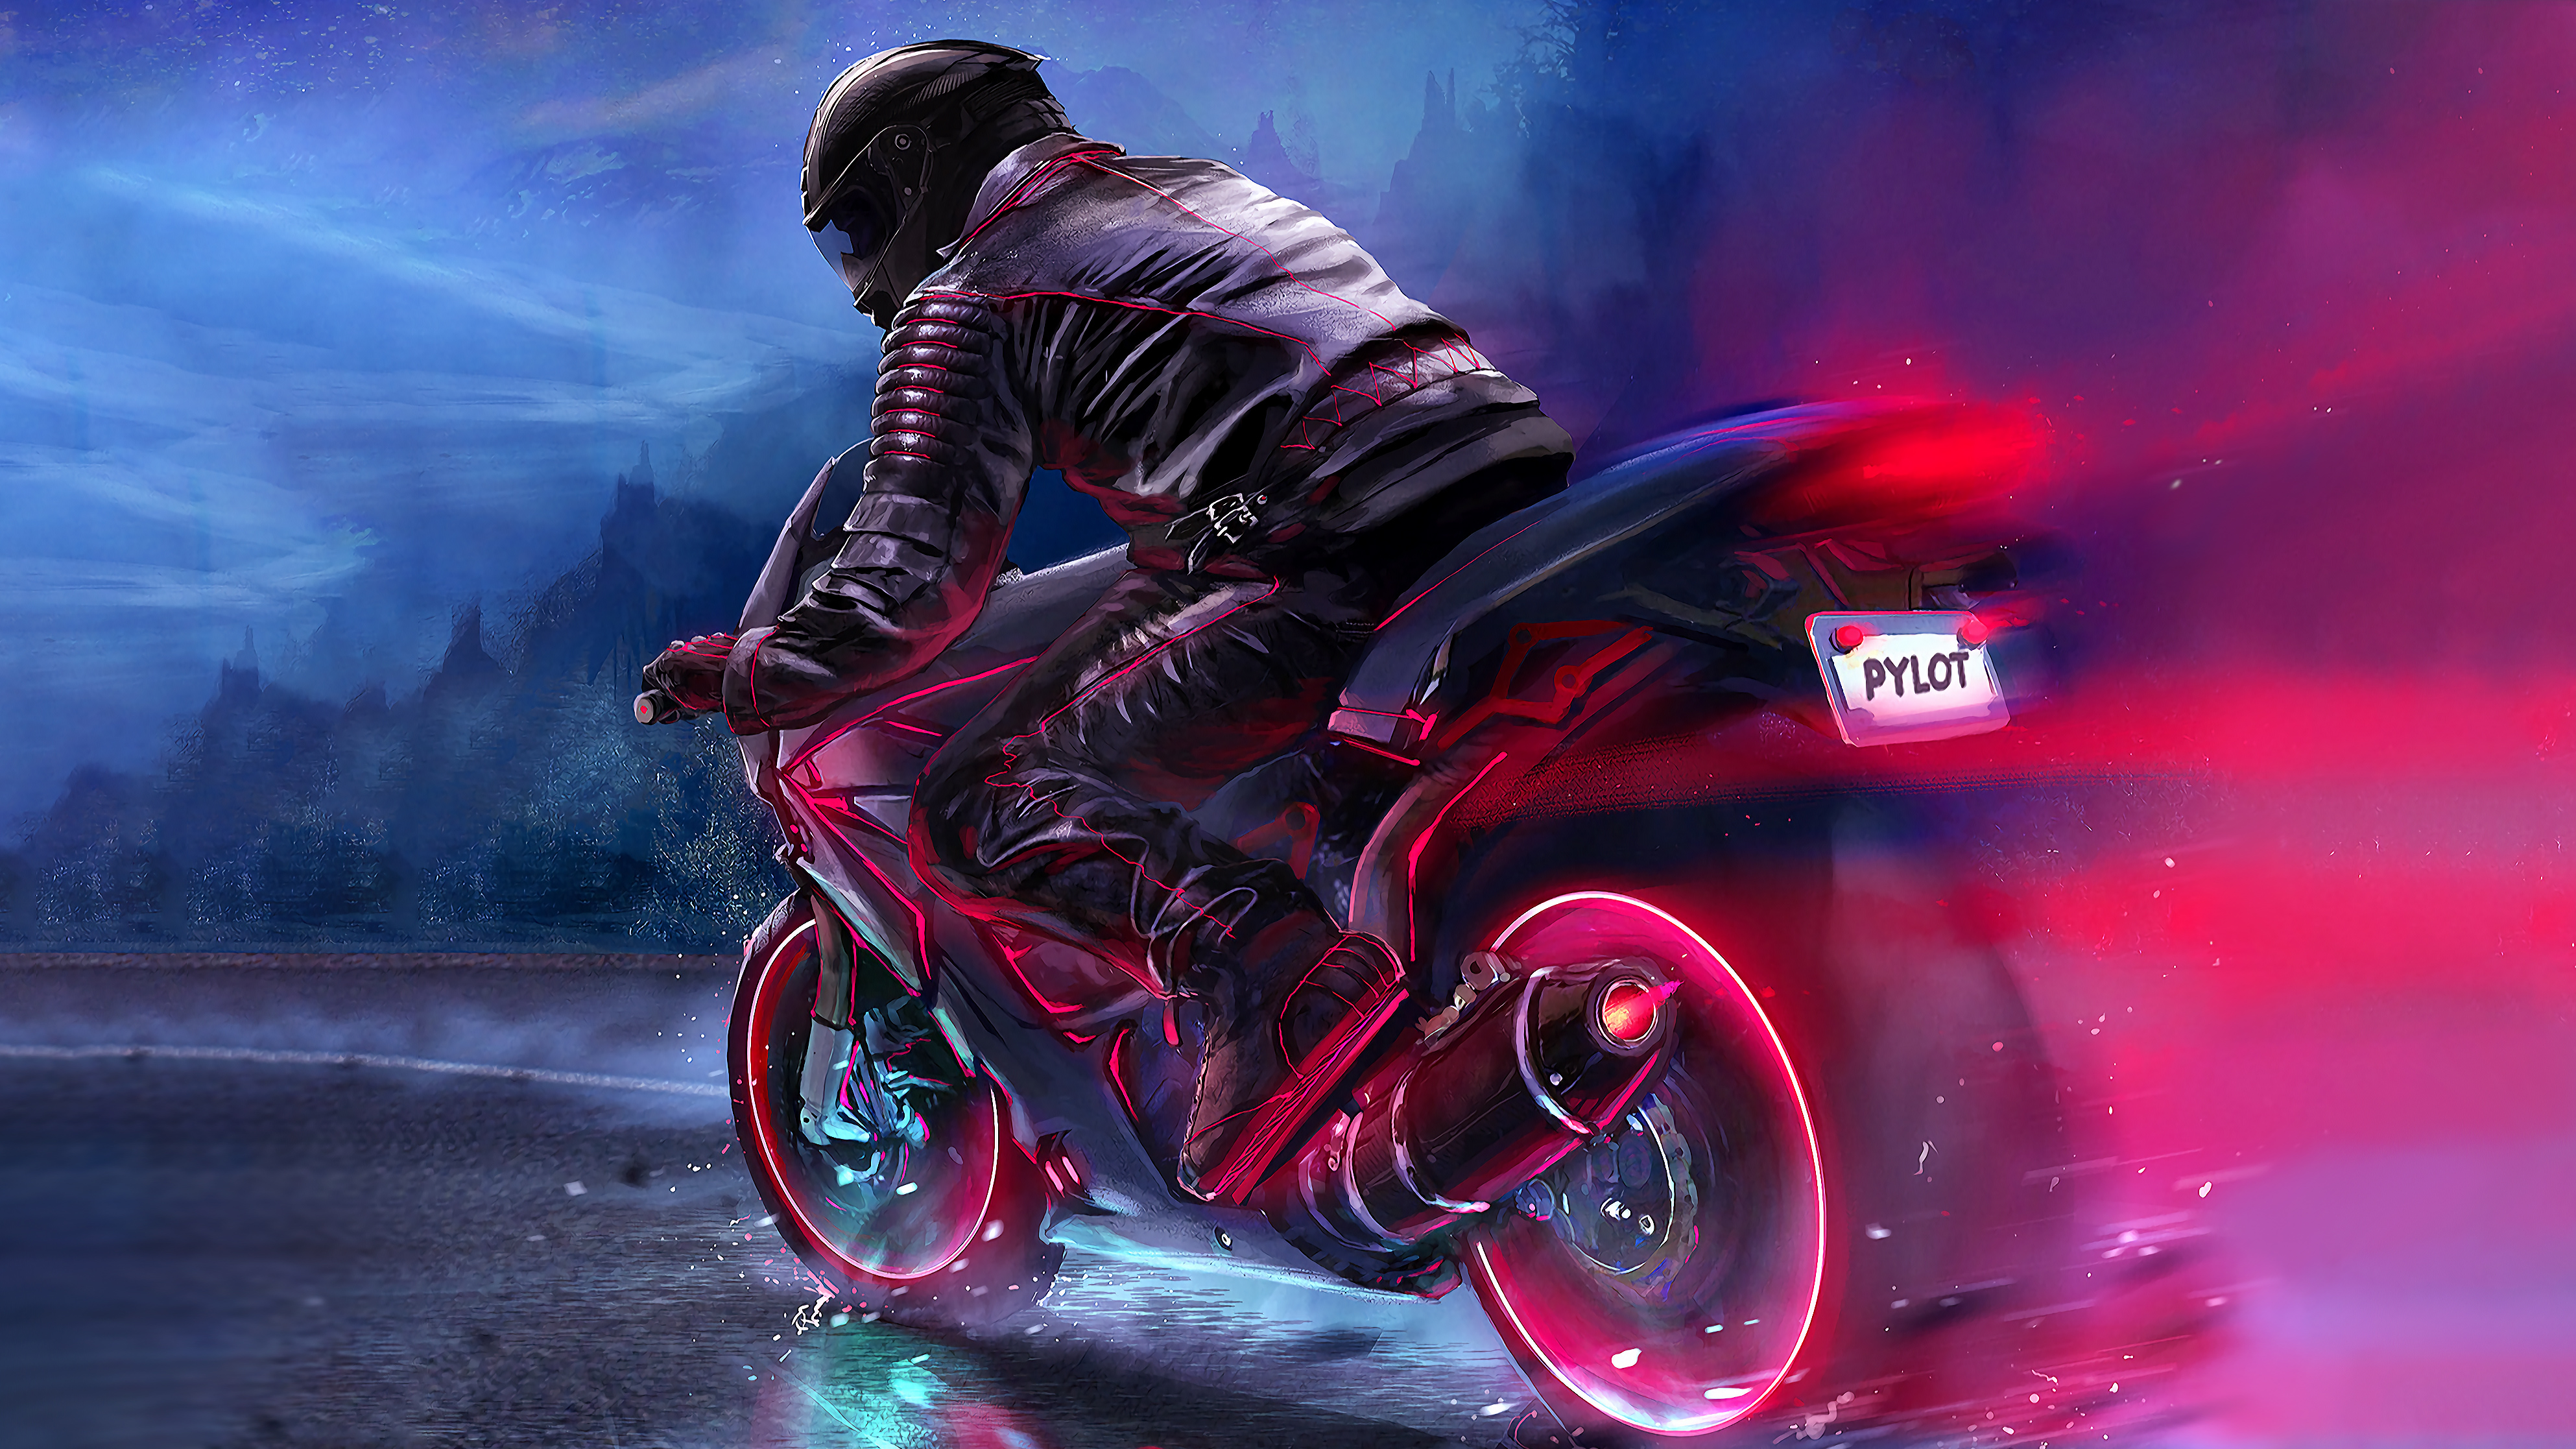 Retro Bike Rider 4k Hd Artist 4k Wallpapers Images